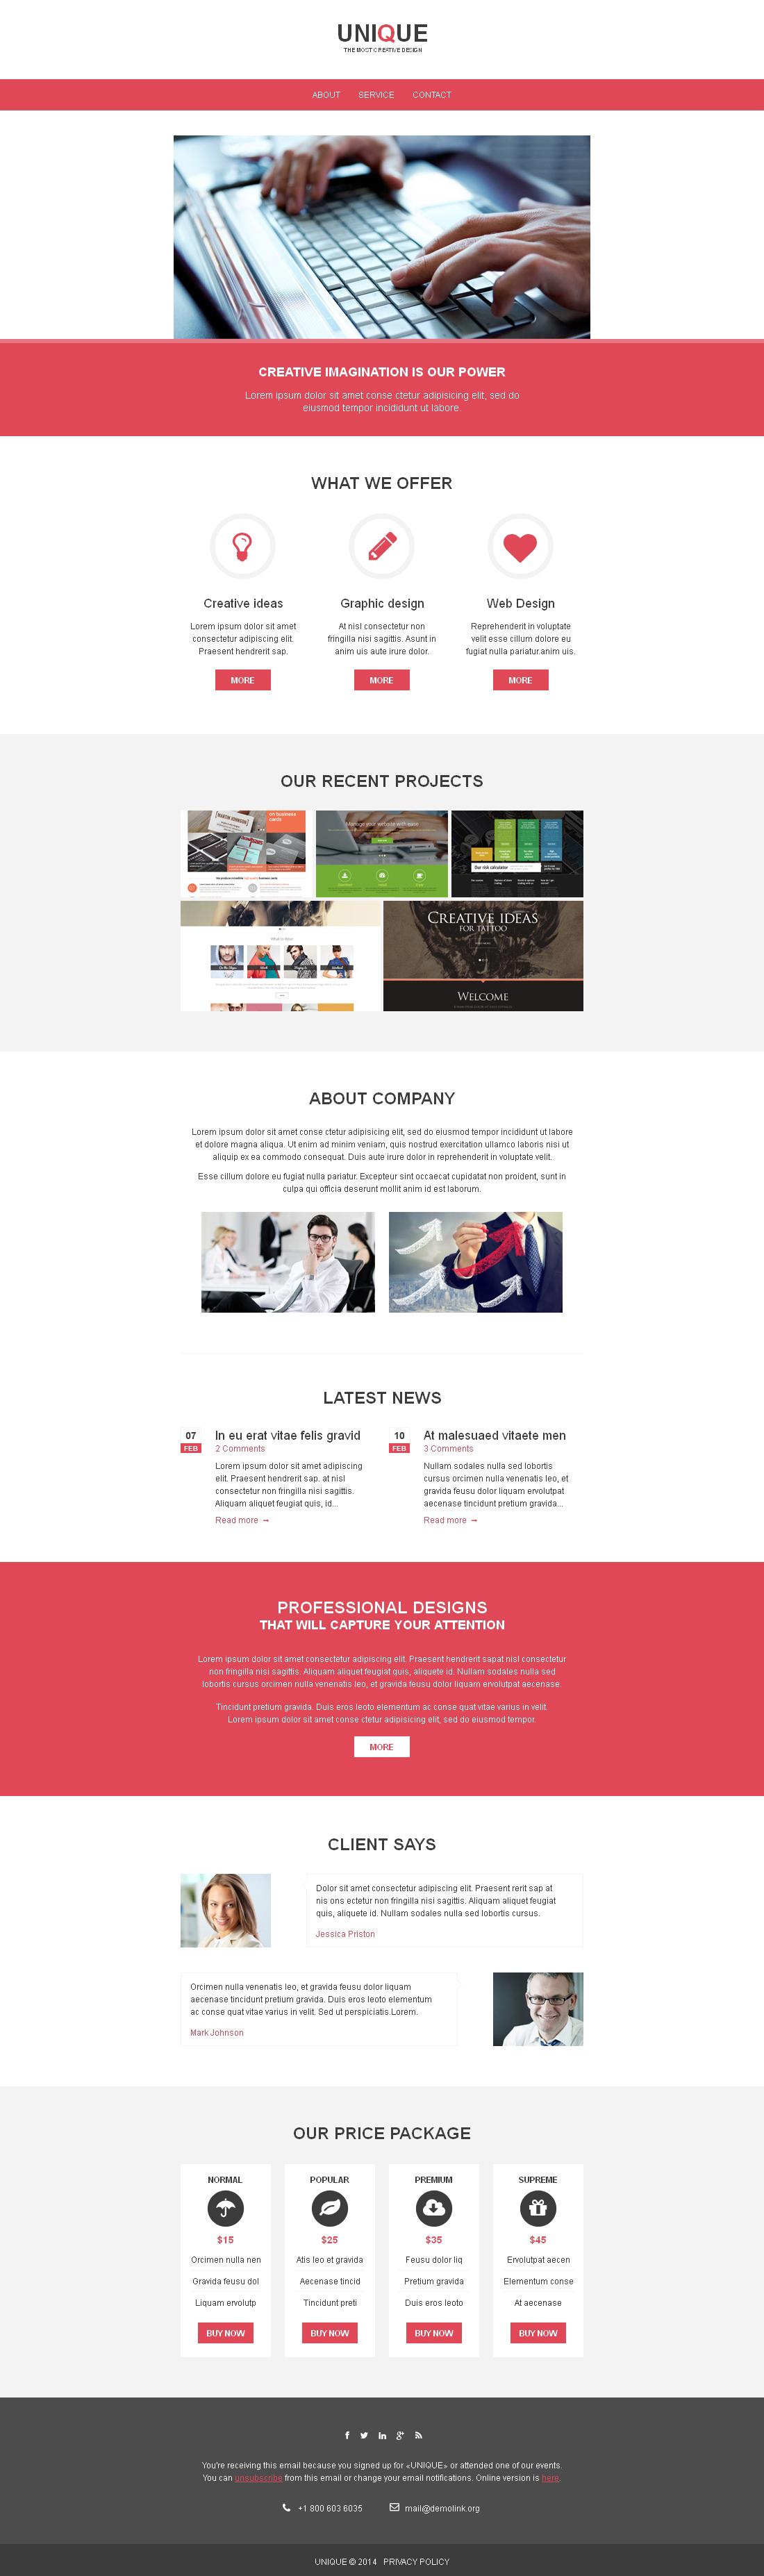 Reszponzív Design studiók Hírlevél sablon 49267